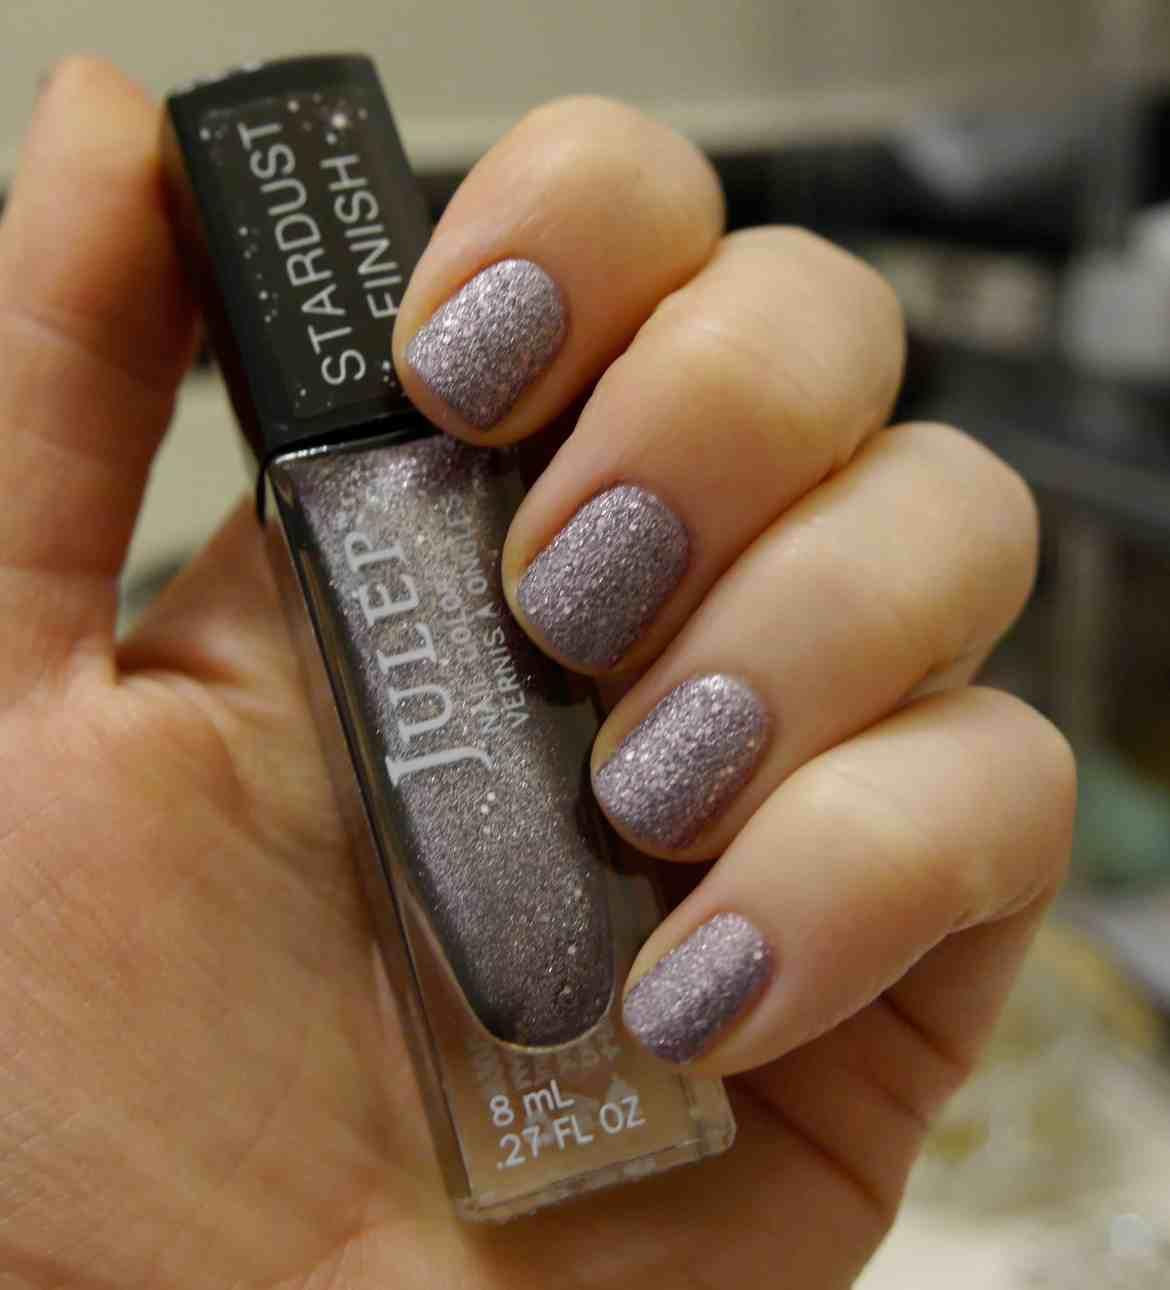 Julep-starbust-nail-polish-cameron-review-swatches.jpeg